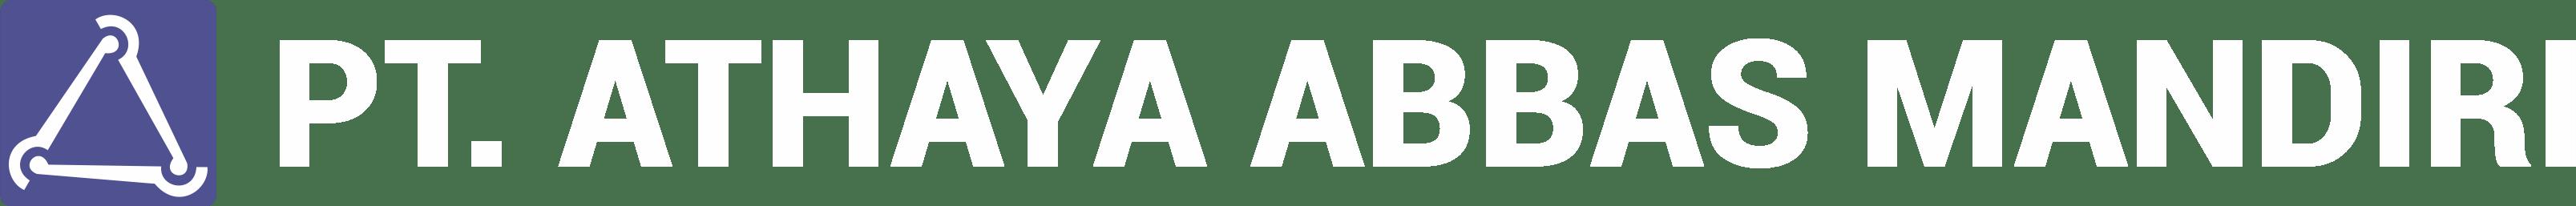 Athaya Abbas Mandiri